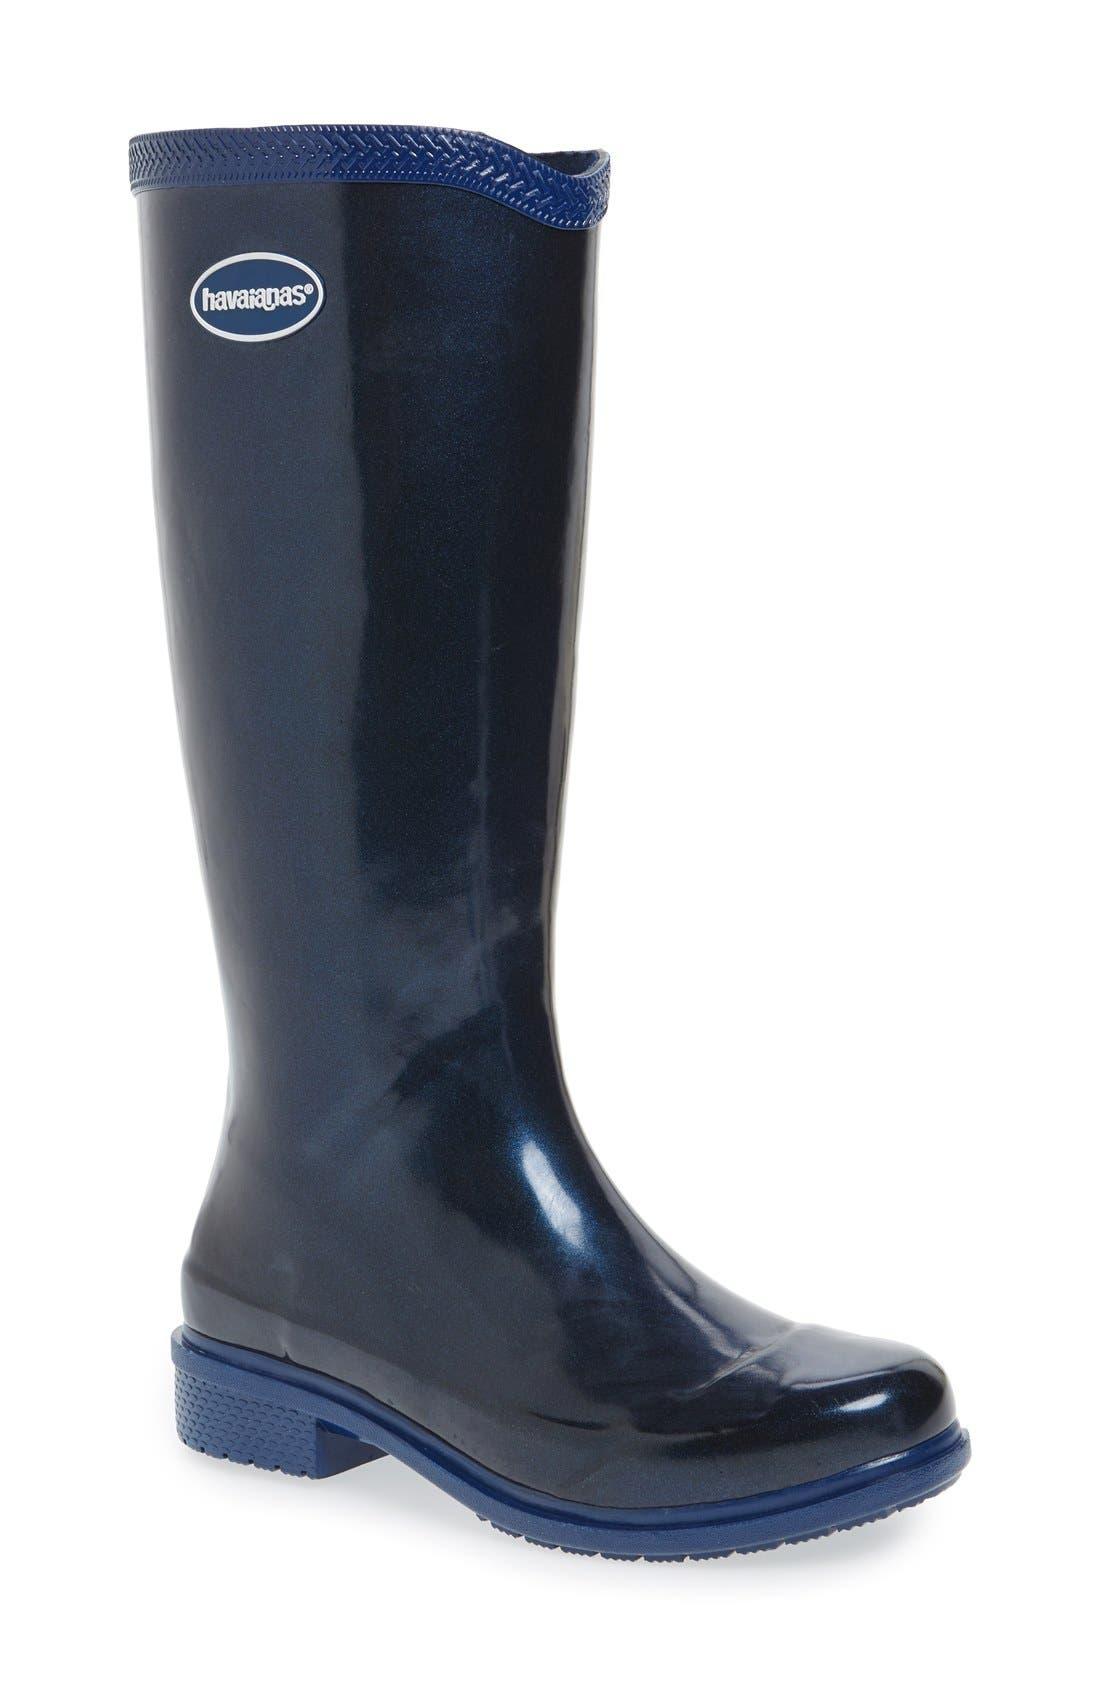 'Galochas Hi Metallic' Waterproof Rain Boot,                             Main thumbnail 1, color,                             Navy Blue Metallic